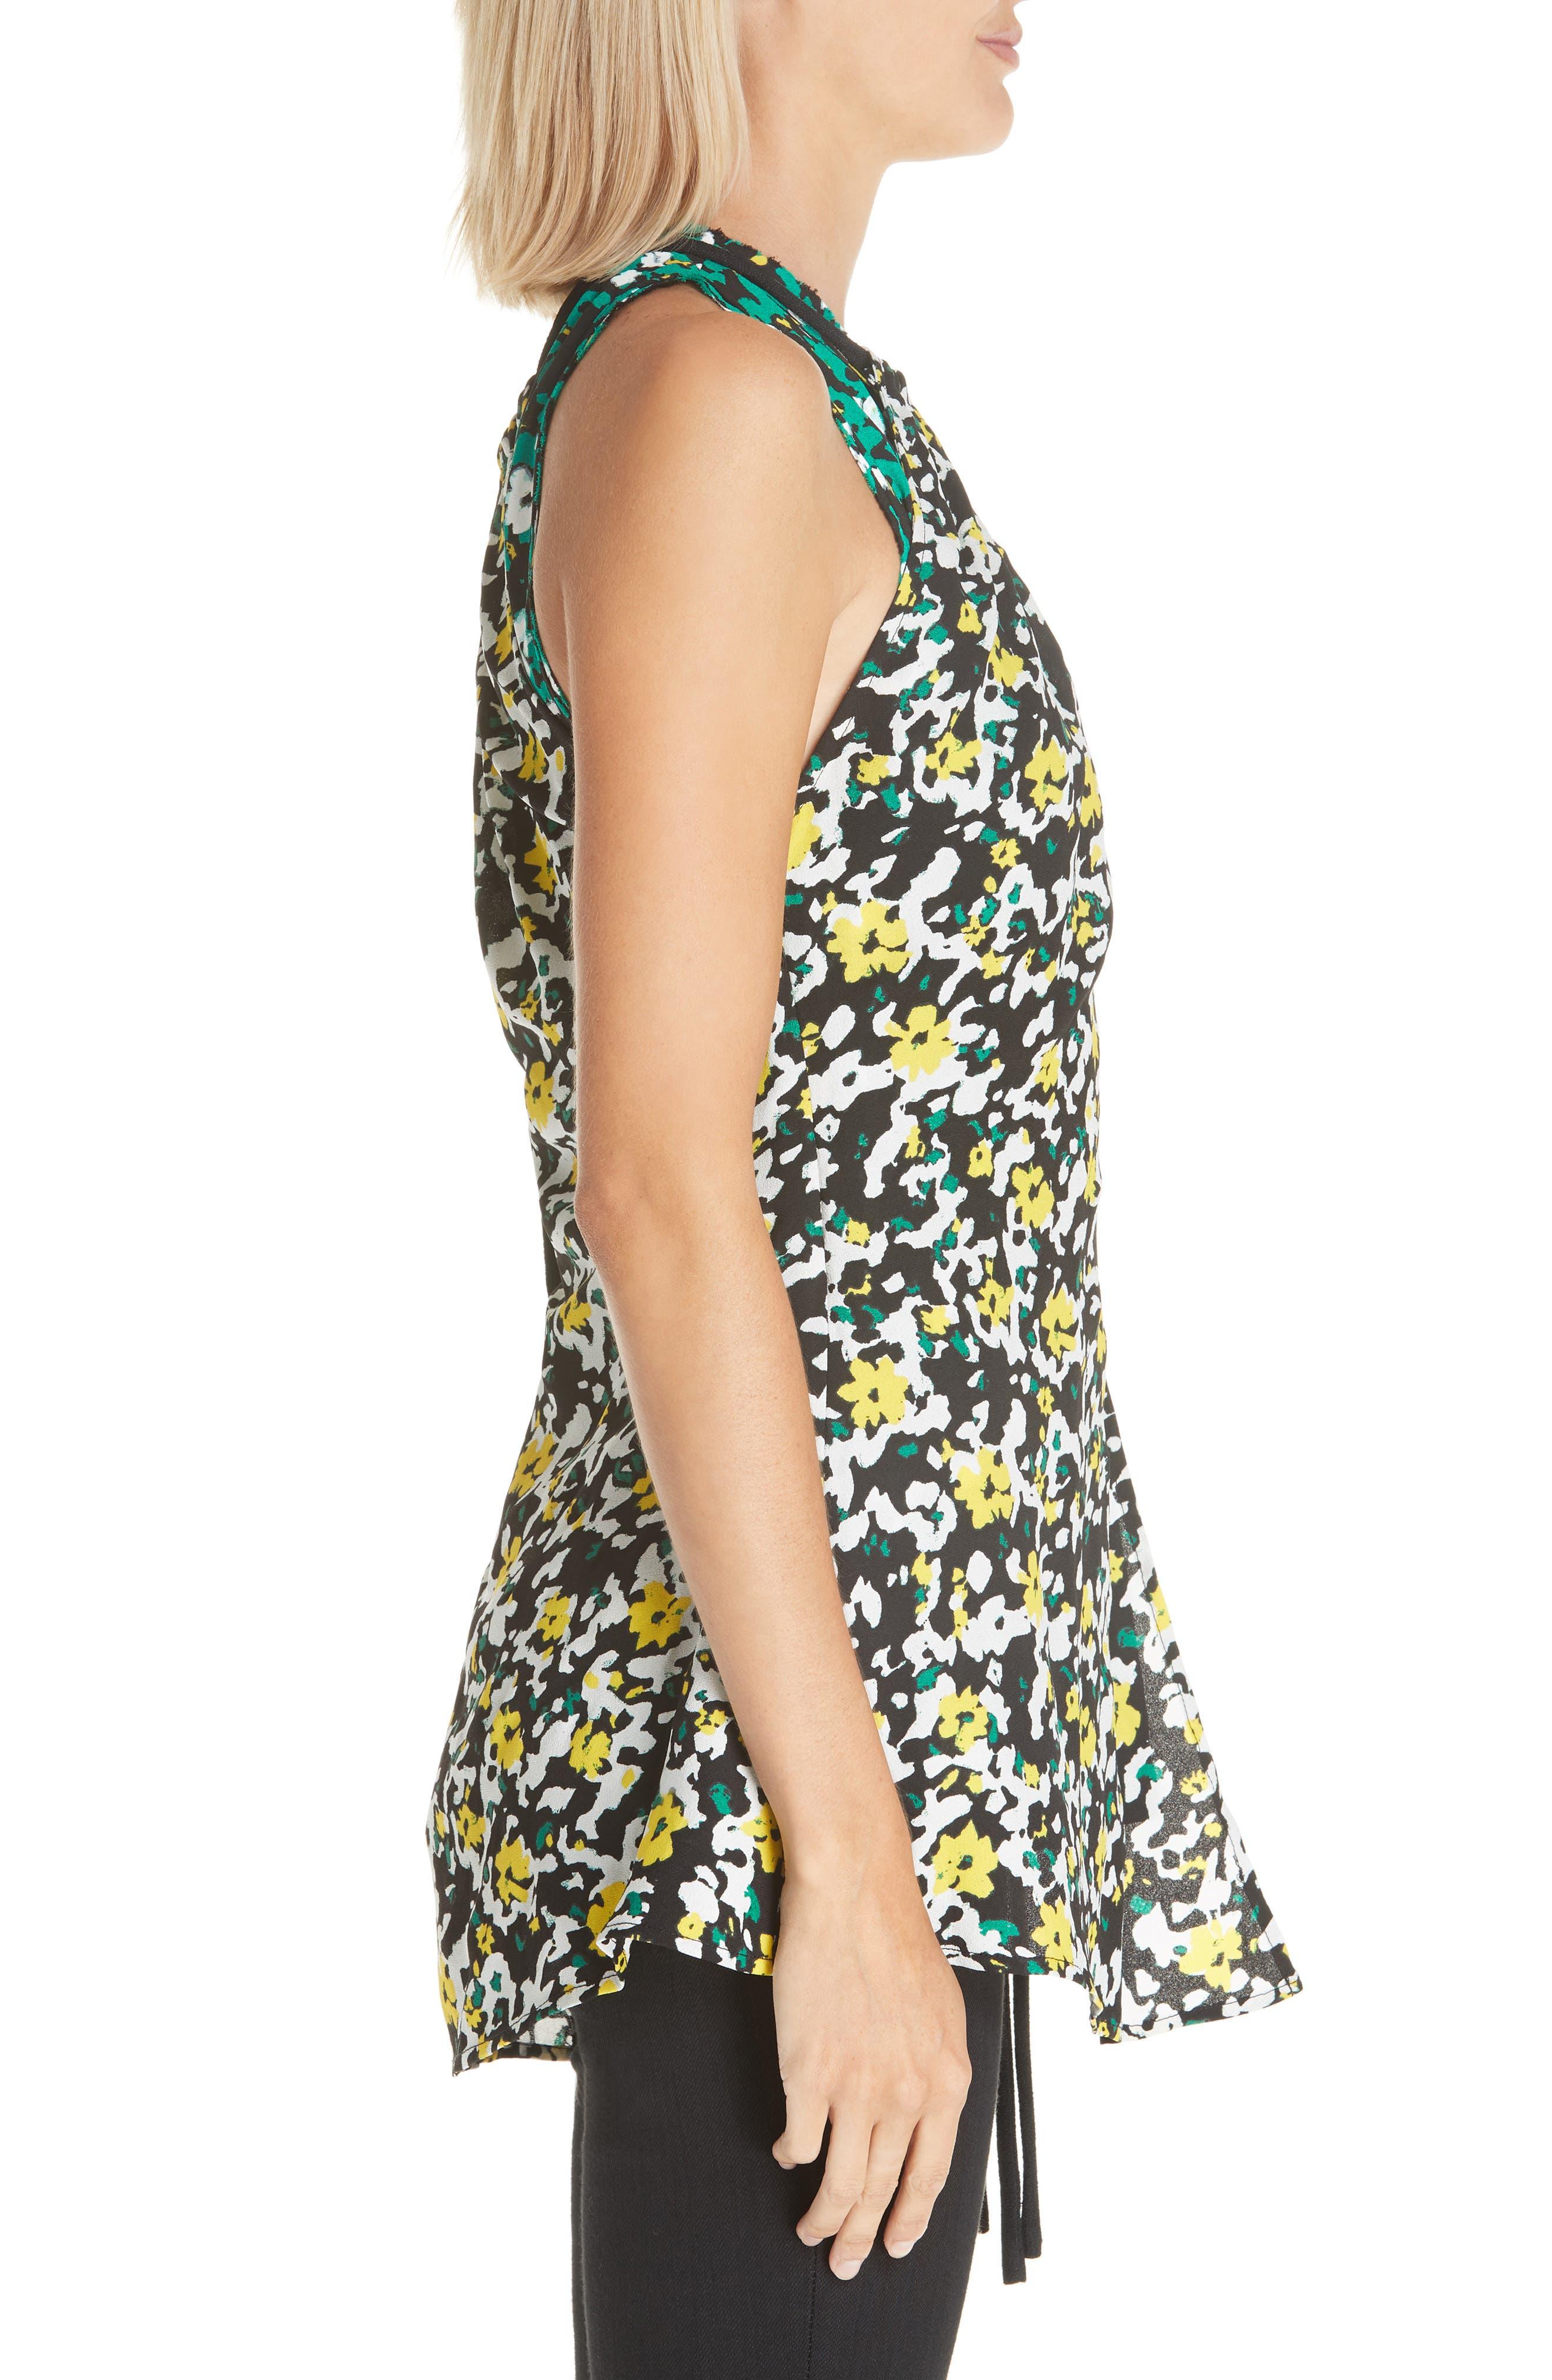 PROENZA SCHOULER, Side Tie Floral Print Blouse, Alternate thumbnail 3, color, WHITE WILDFLOWER